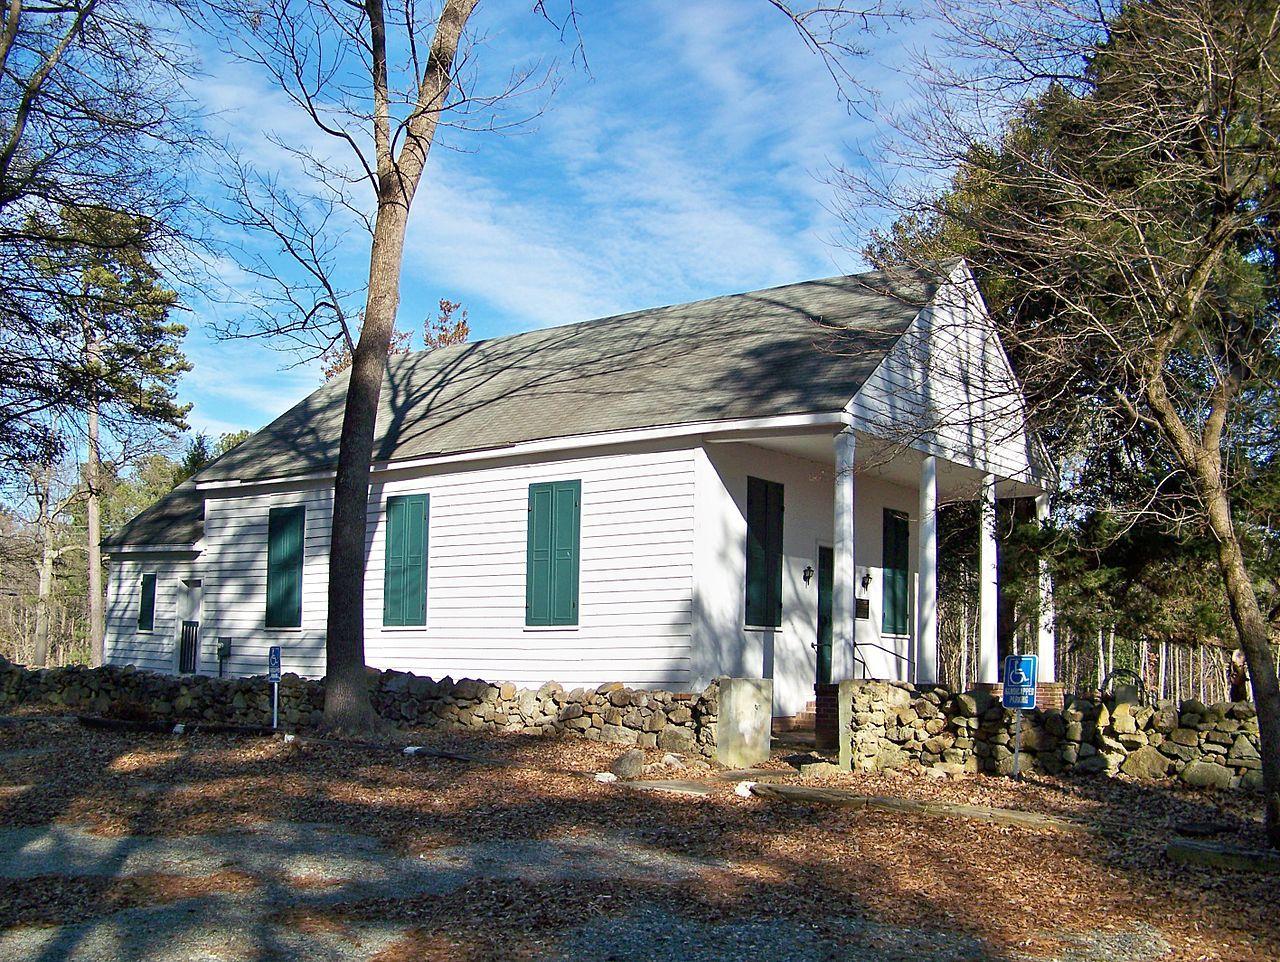 St. Joseph's Catholic Church in Gaston County, North Carolina.